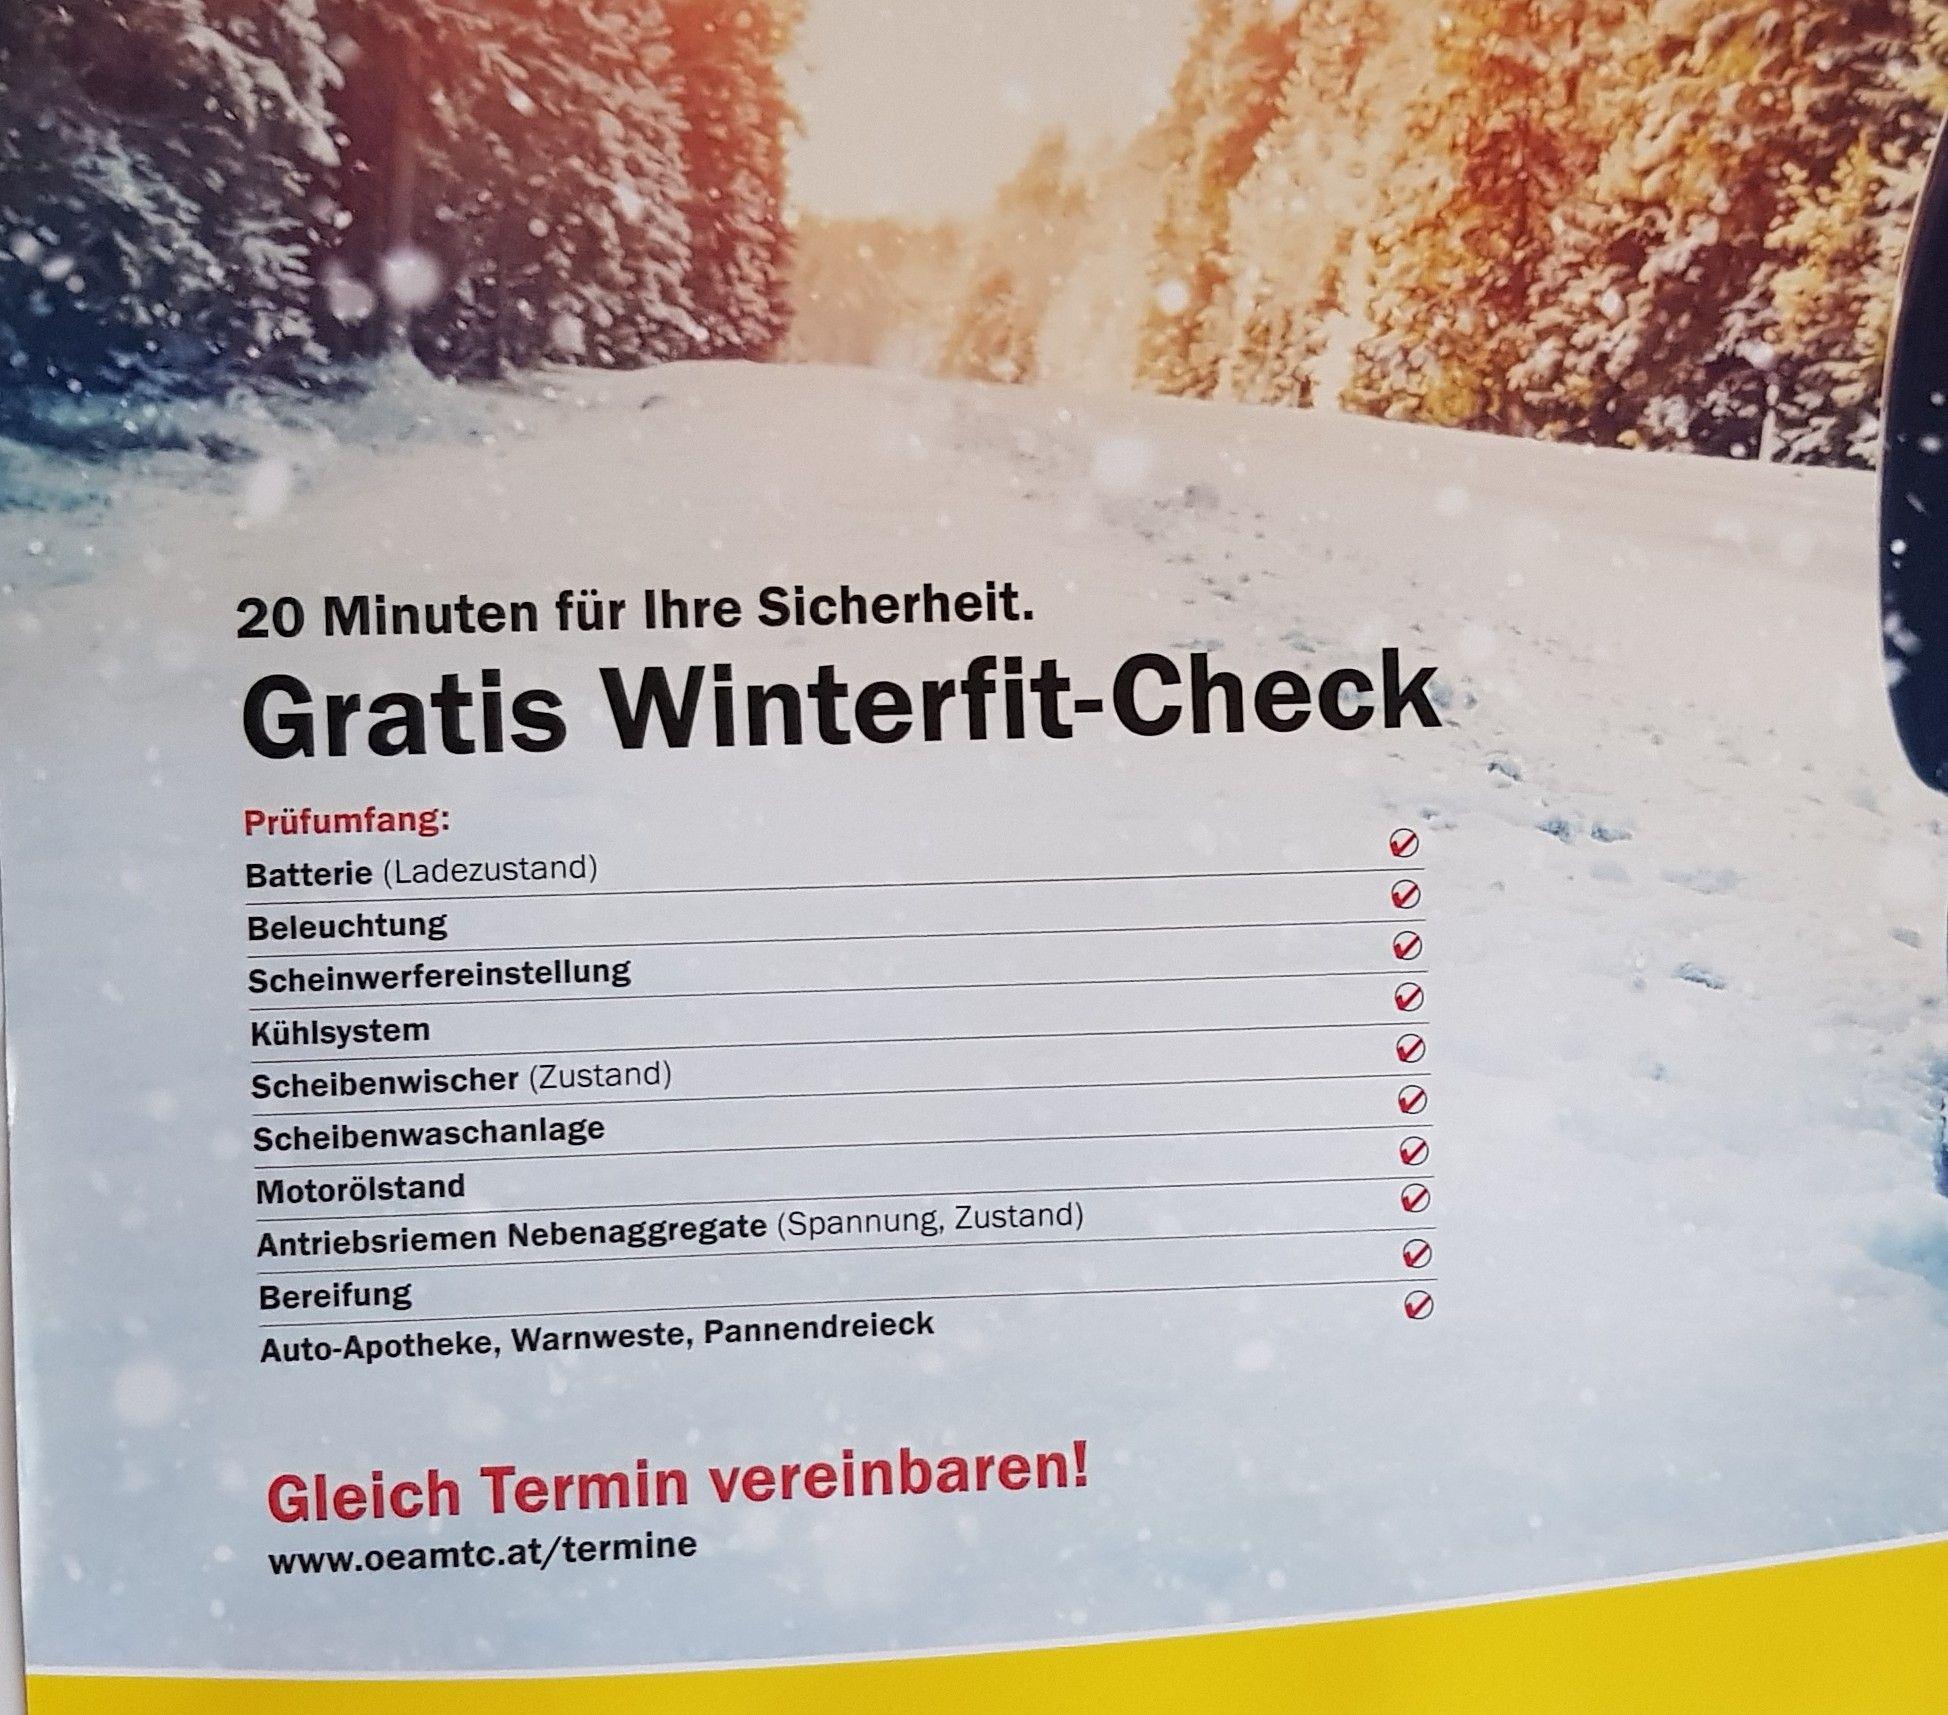 ÖAMTC Gratis Winterfit-Check